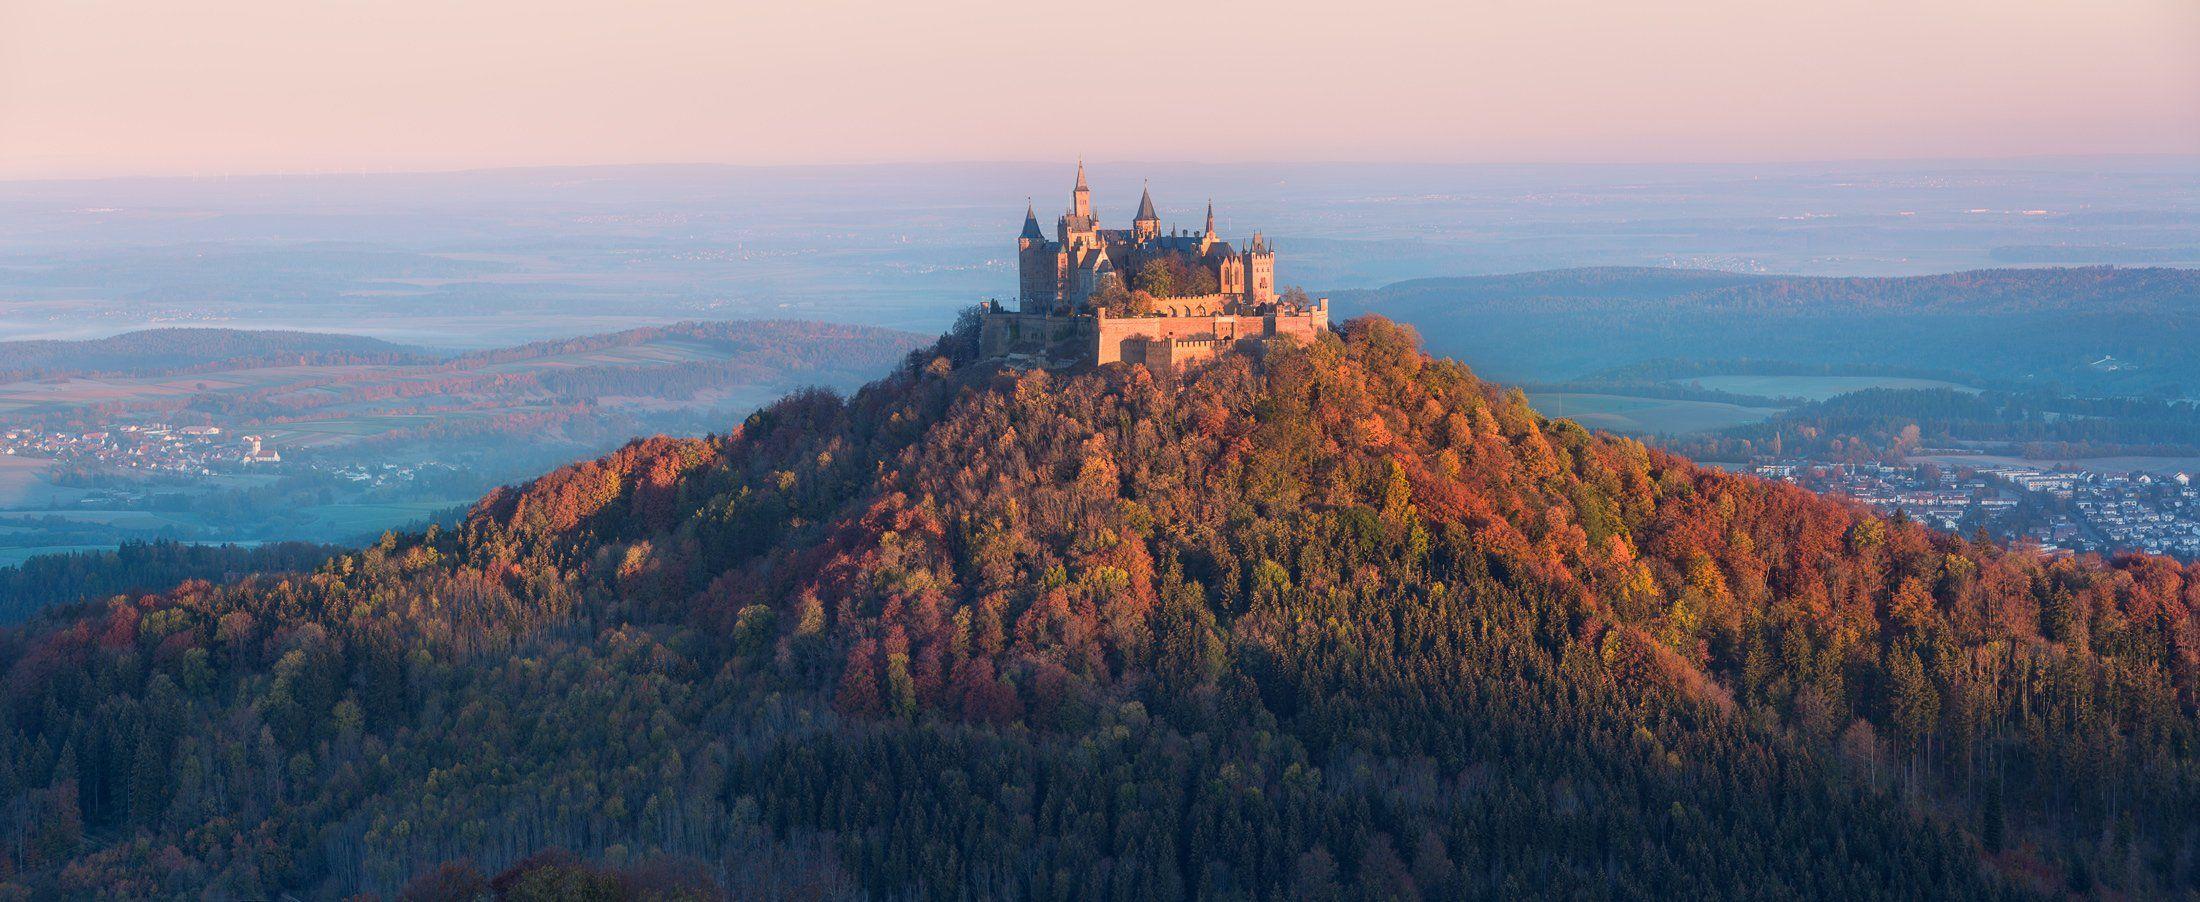 sv-phototravel.com, замок гогенцоллерн, hohenzollern, Валерий Щербина (sv-phototravel.com)